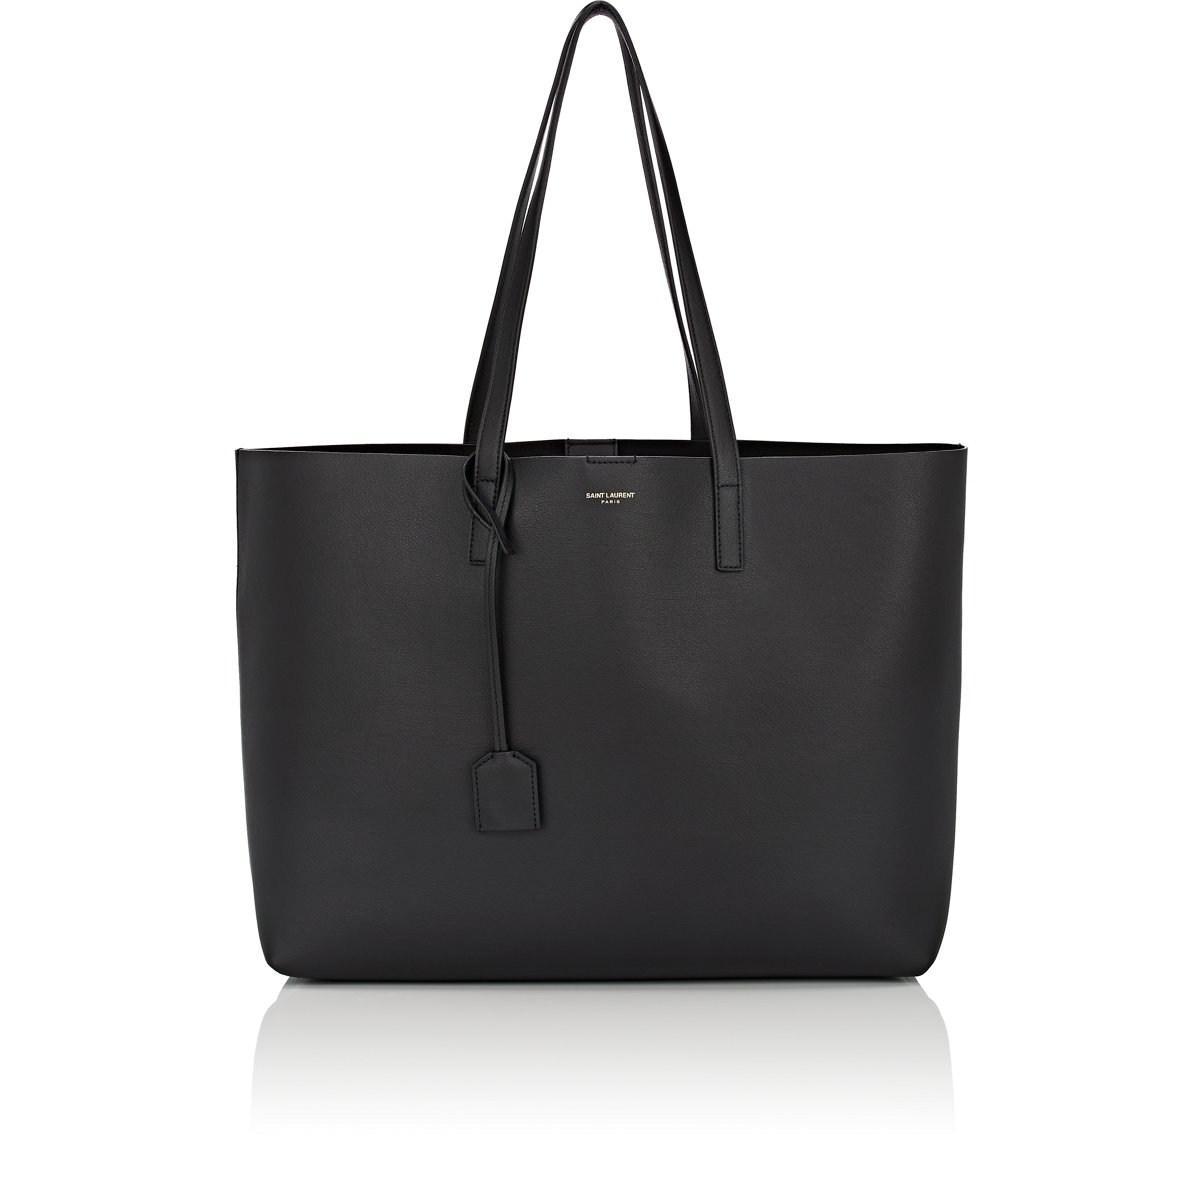 572700770ebb Lyst - Saint Laurent East-west Shopper Leather Tote Bag in Black